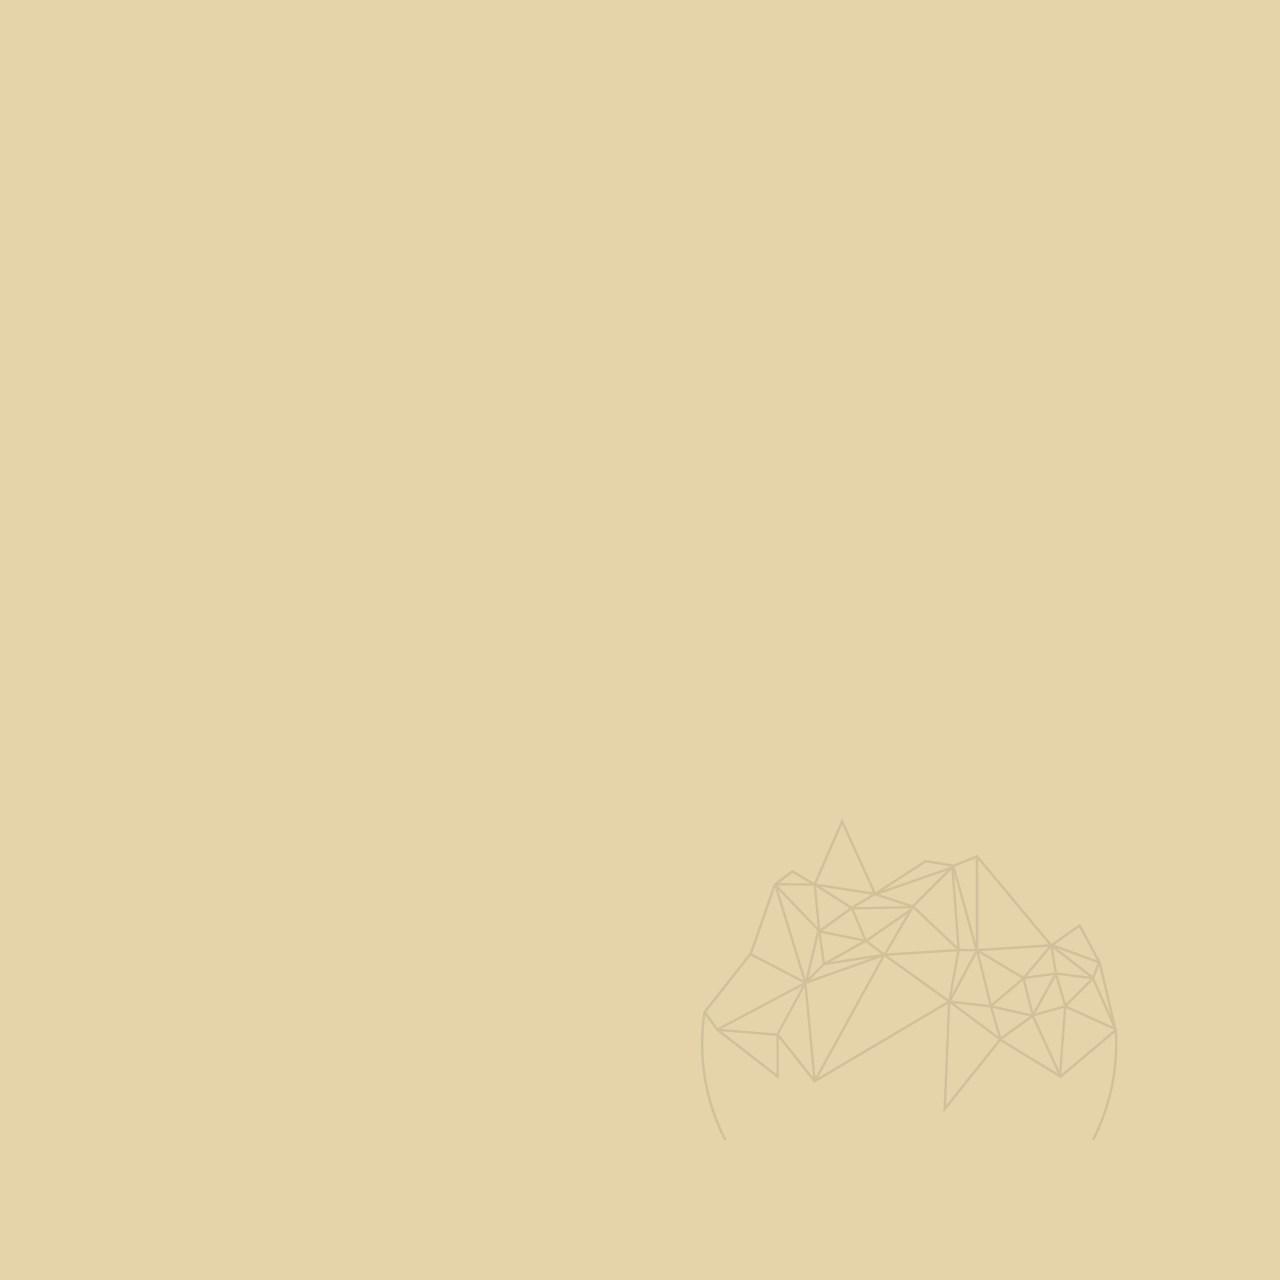 Weber Color Perfect Sesame 2 KG - Flexible wall & floor grout